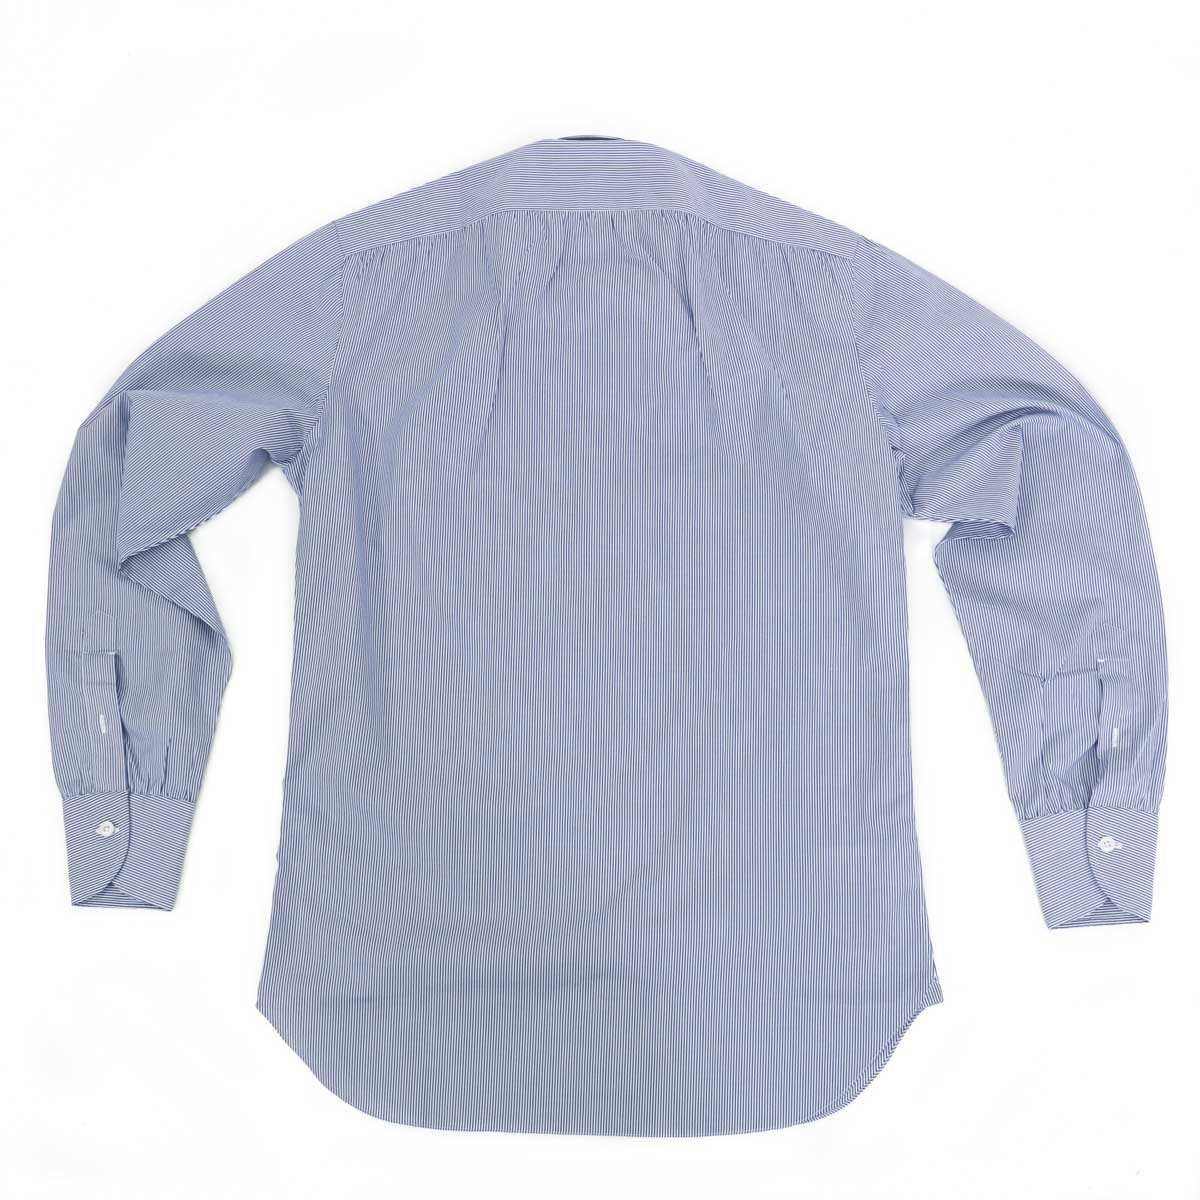 RING JACKET Napoli ショートポイント レギュラーカラーシャツ 【ネイビー】